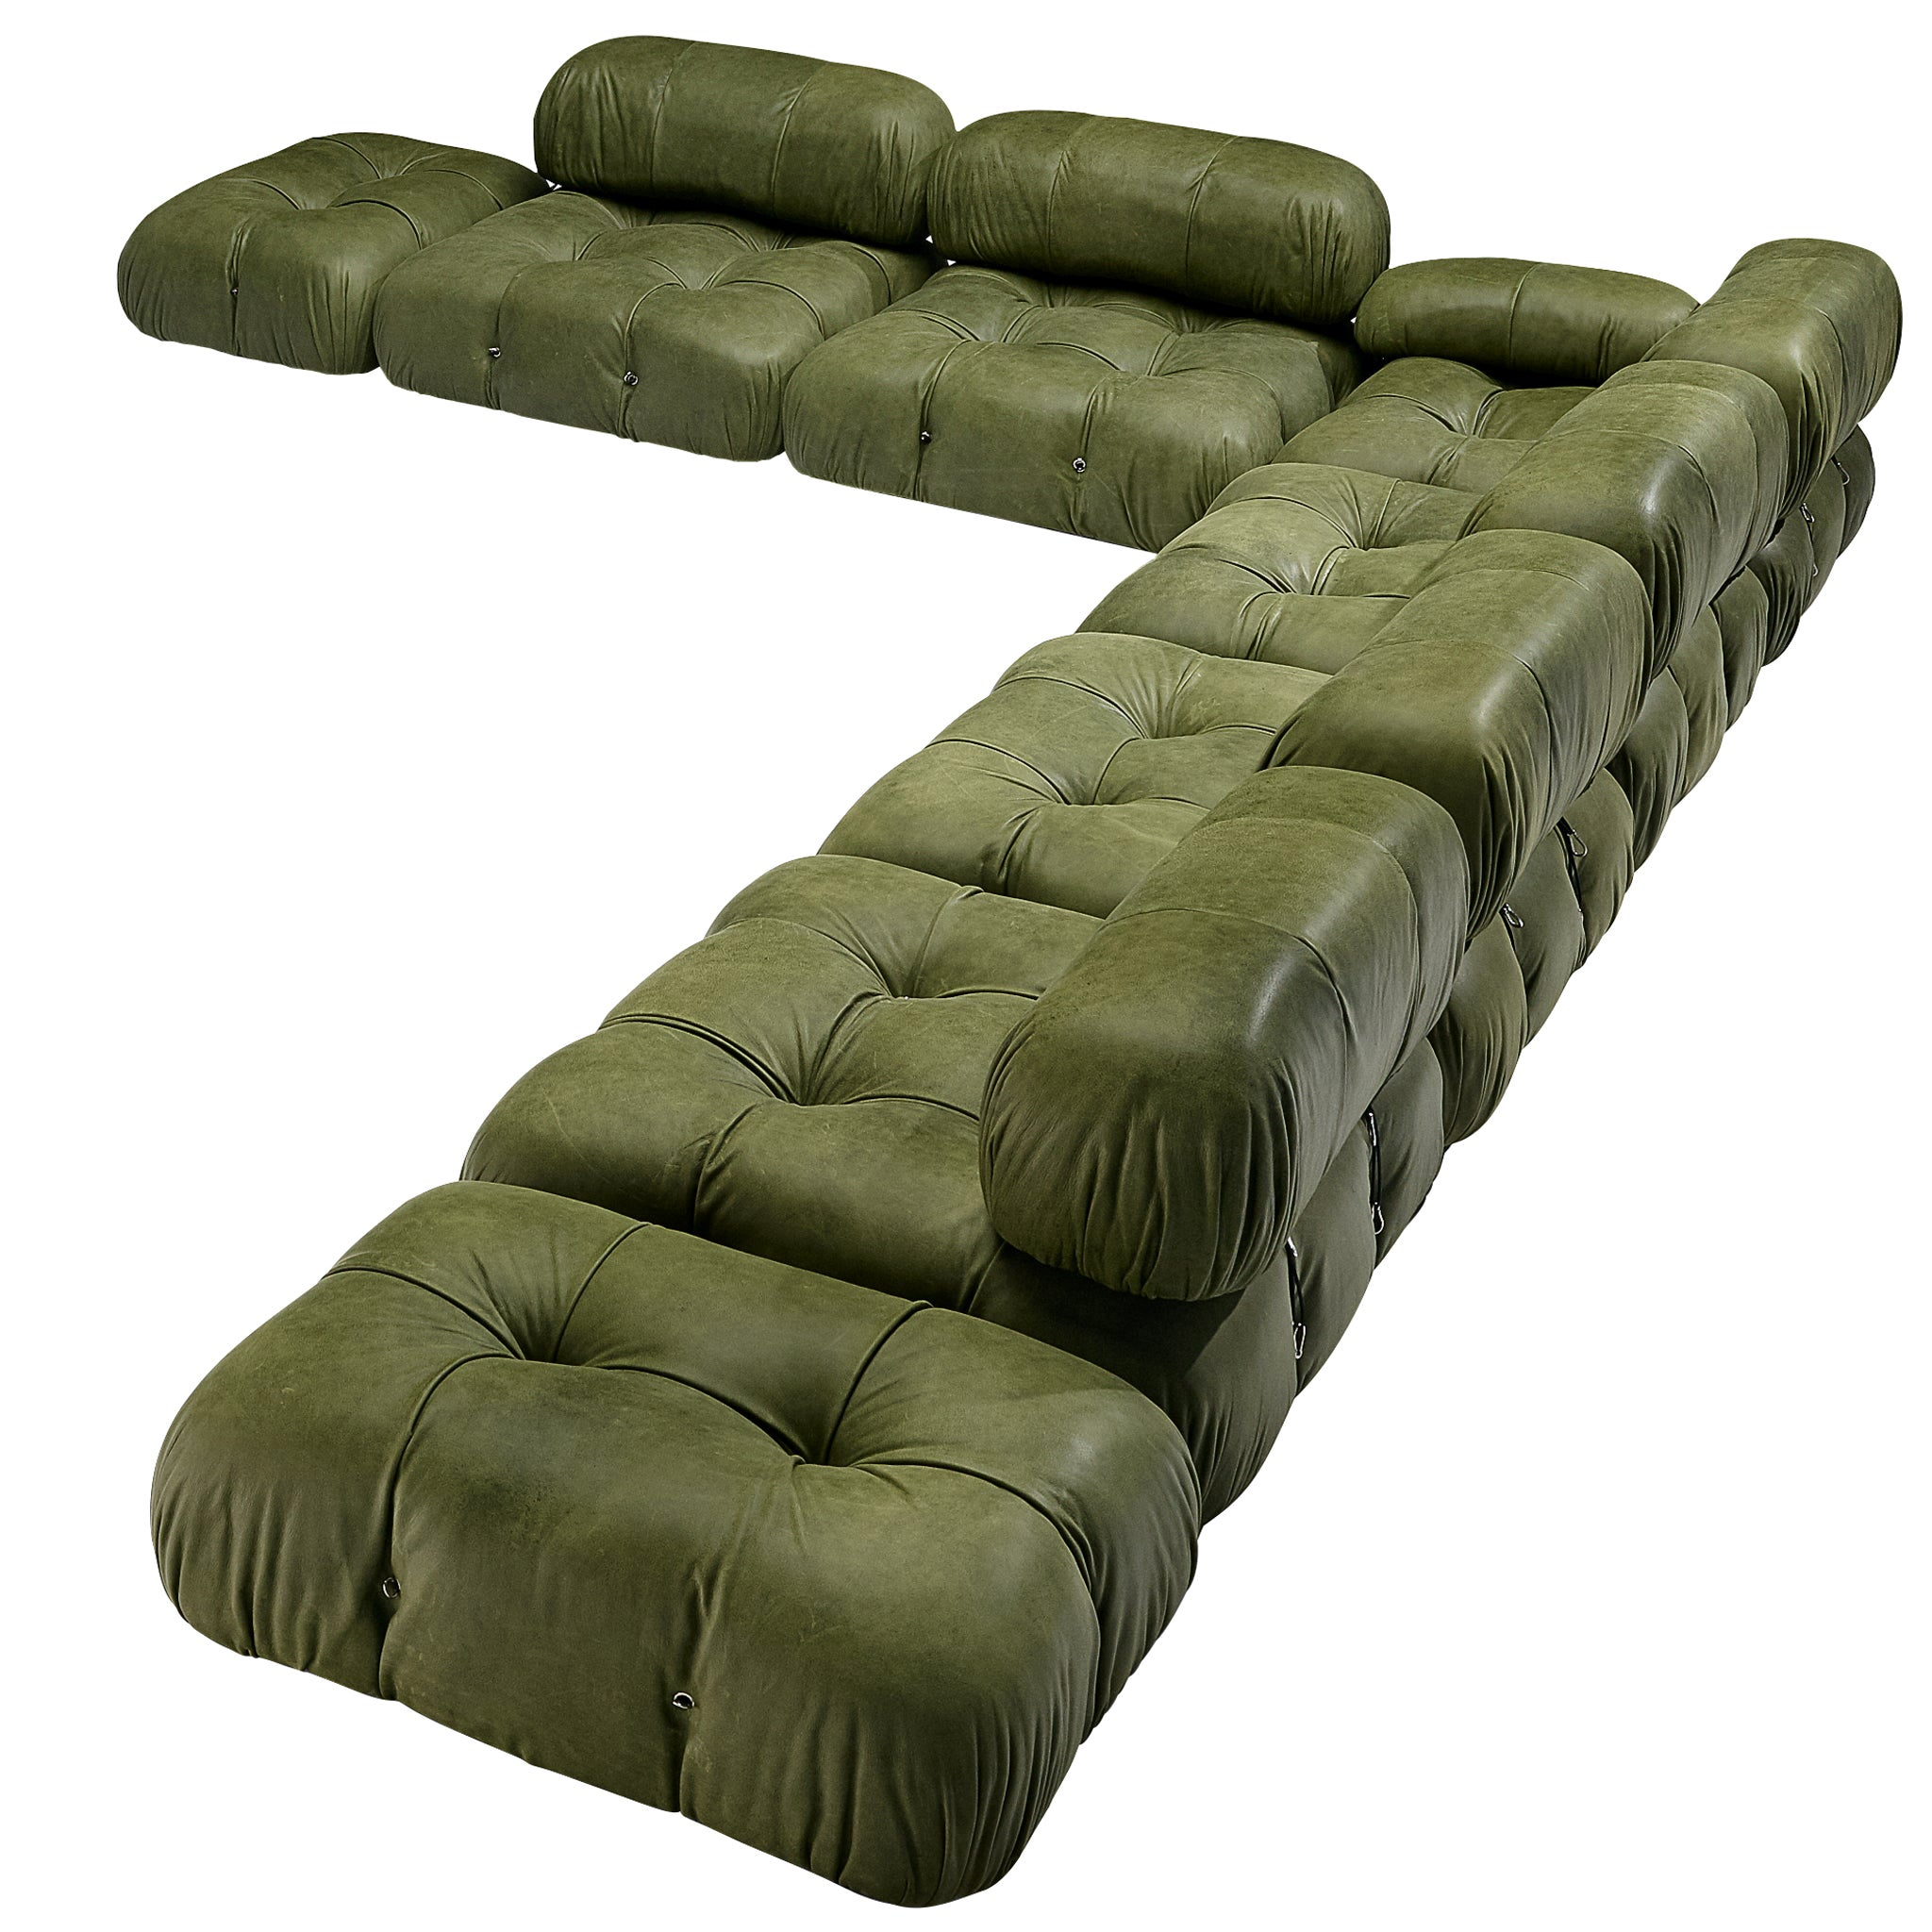 Mario Bellini 'Camaleonda' Sectional Sofa in Green Leather